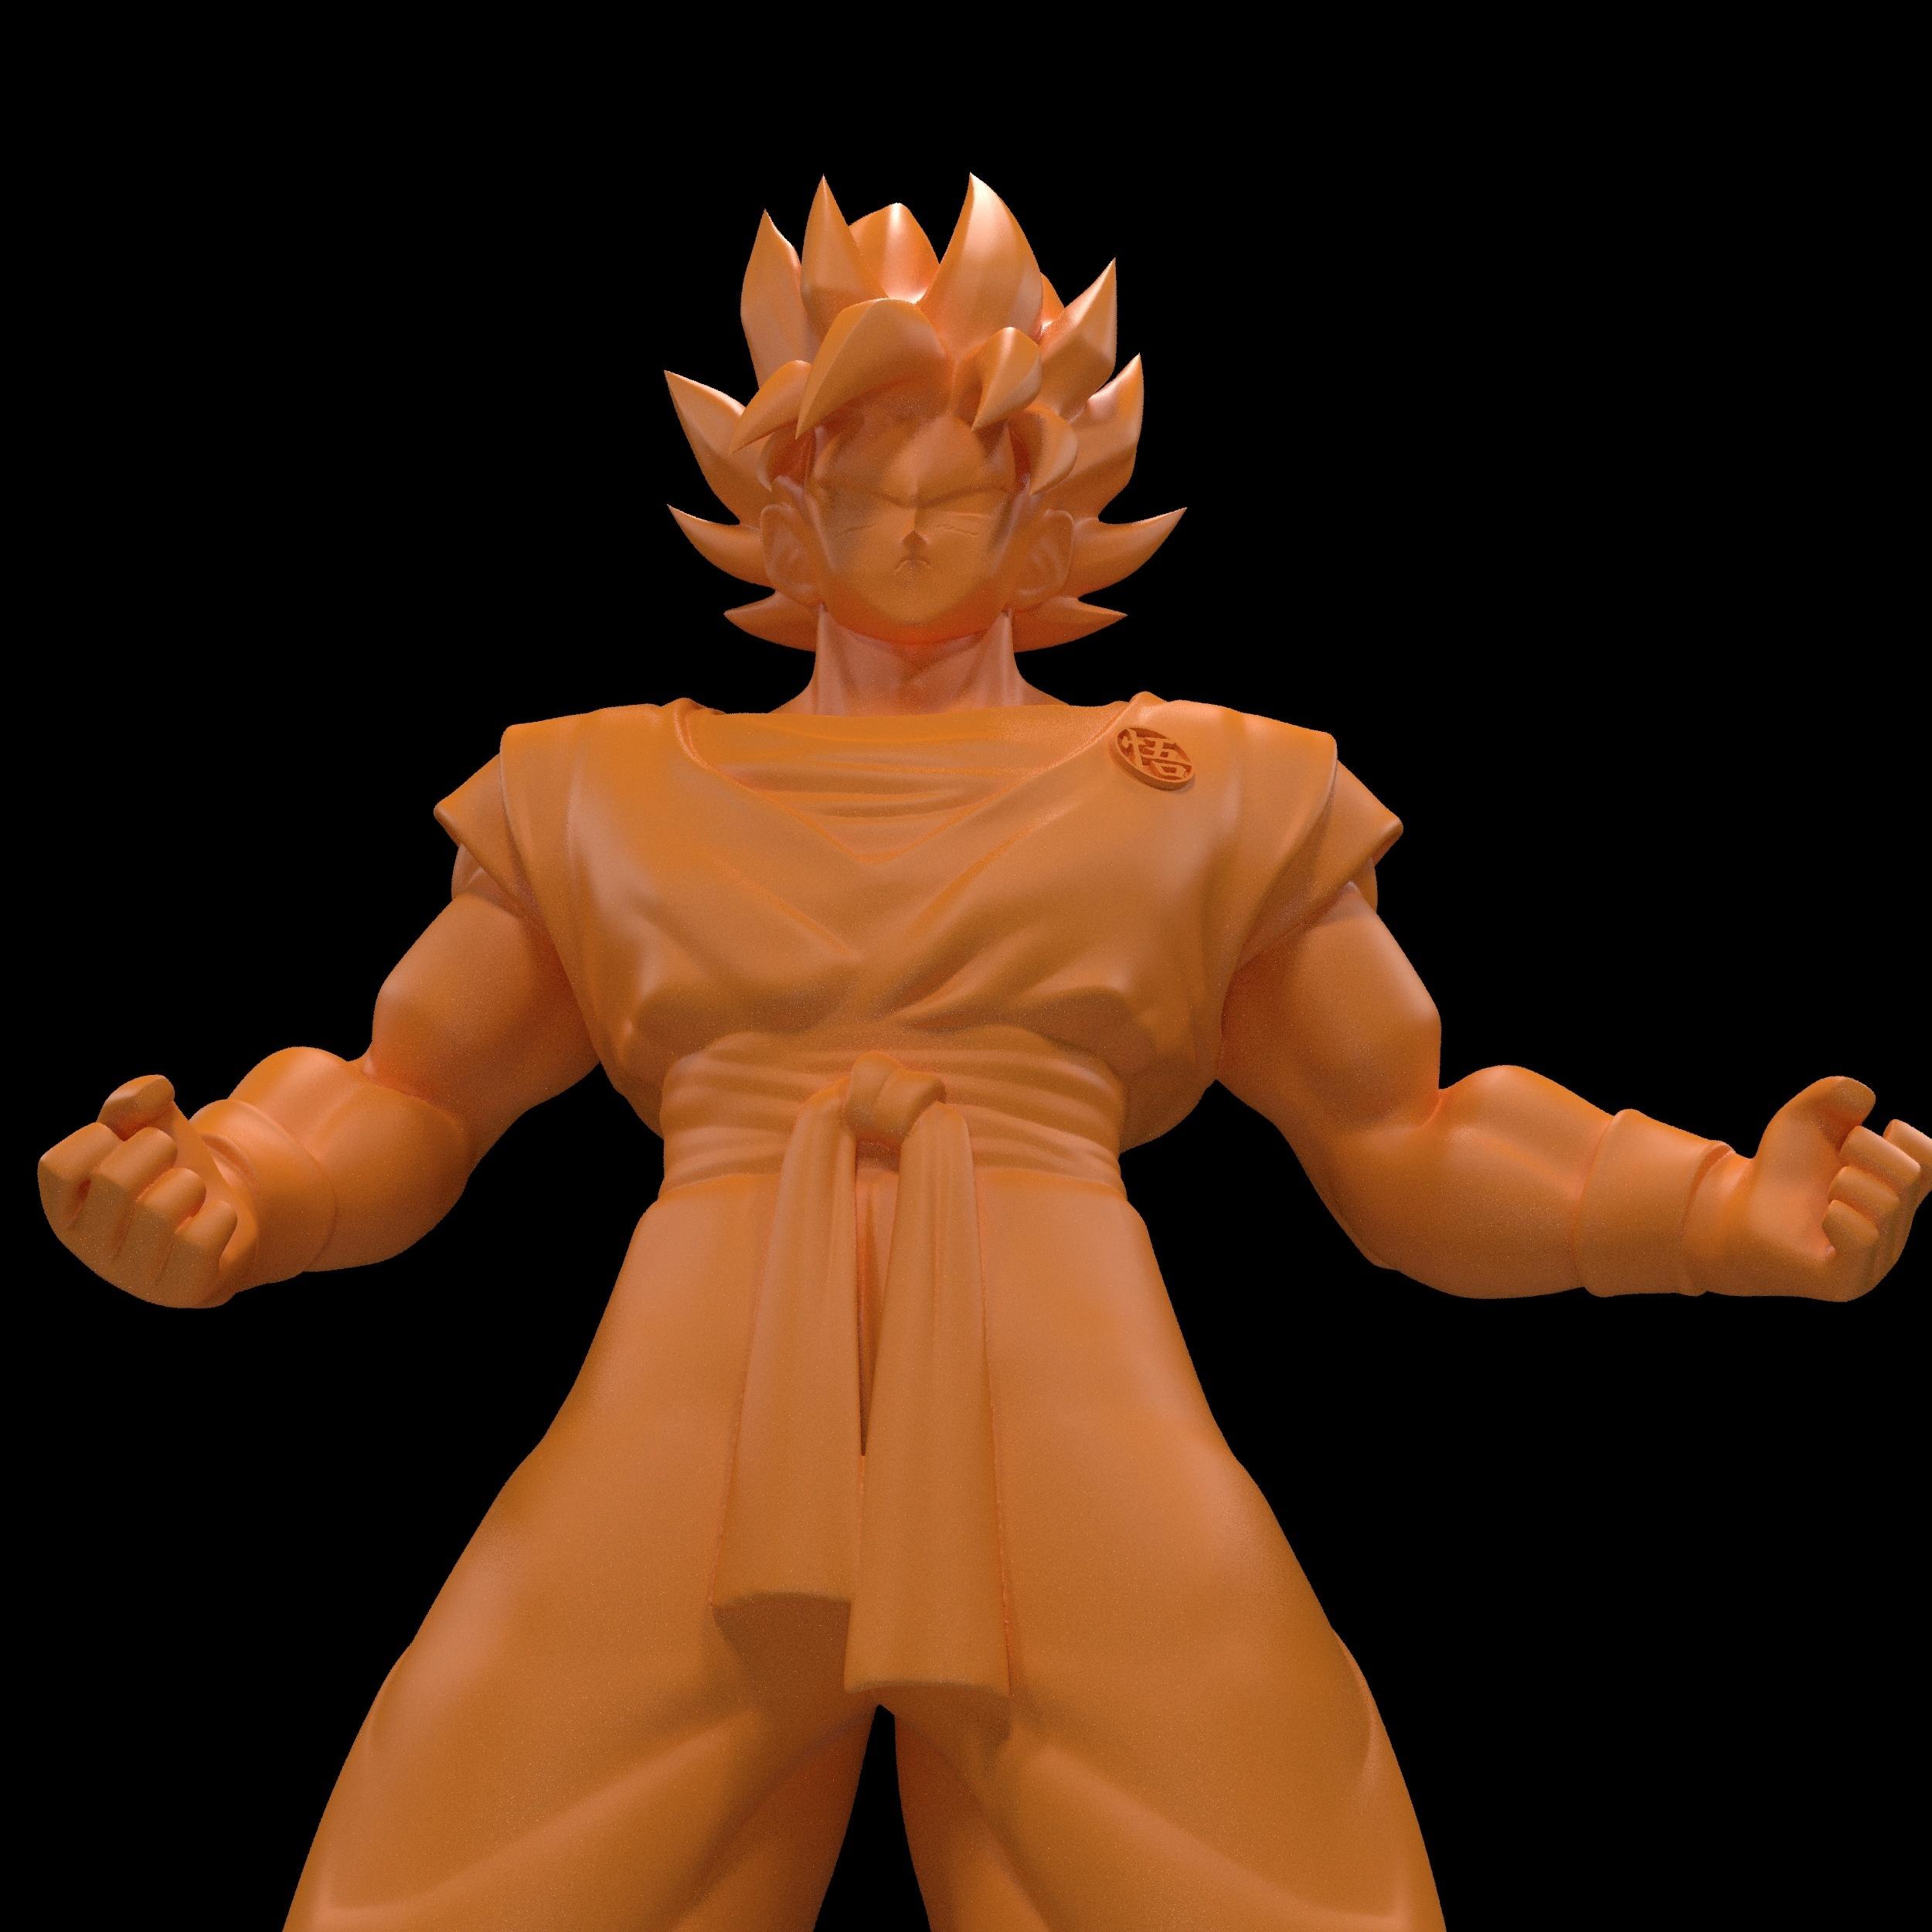 8.jpg Download free STL file Goku (Super Saiyan) • 3D printer template, paltony22